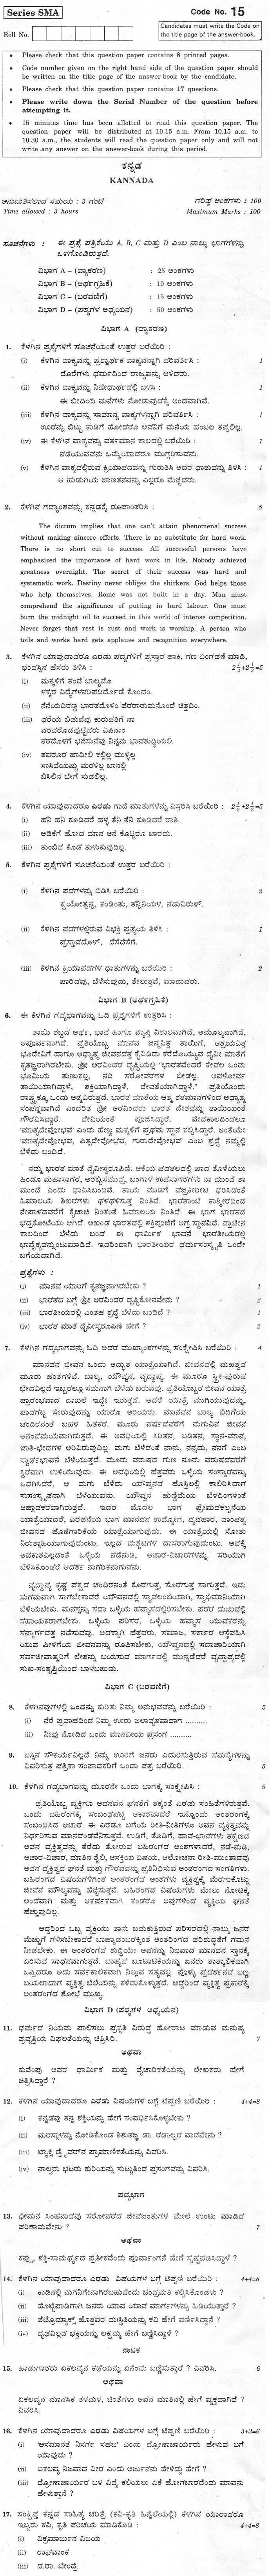 CBSE Class XII Previous Year Question Paper 2012 Kannada